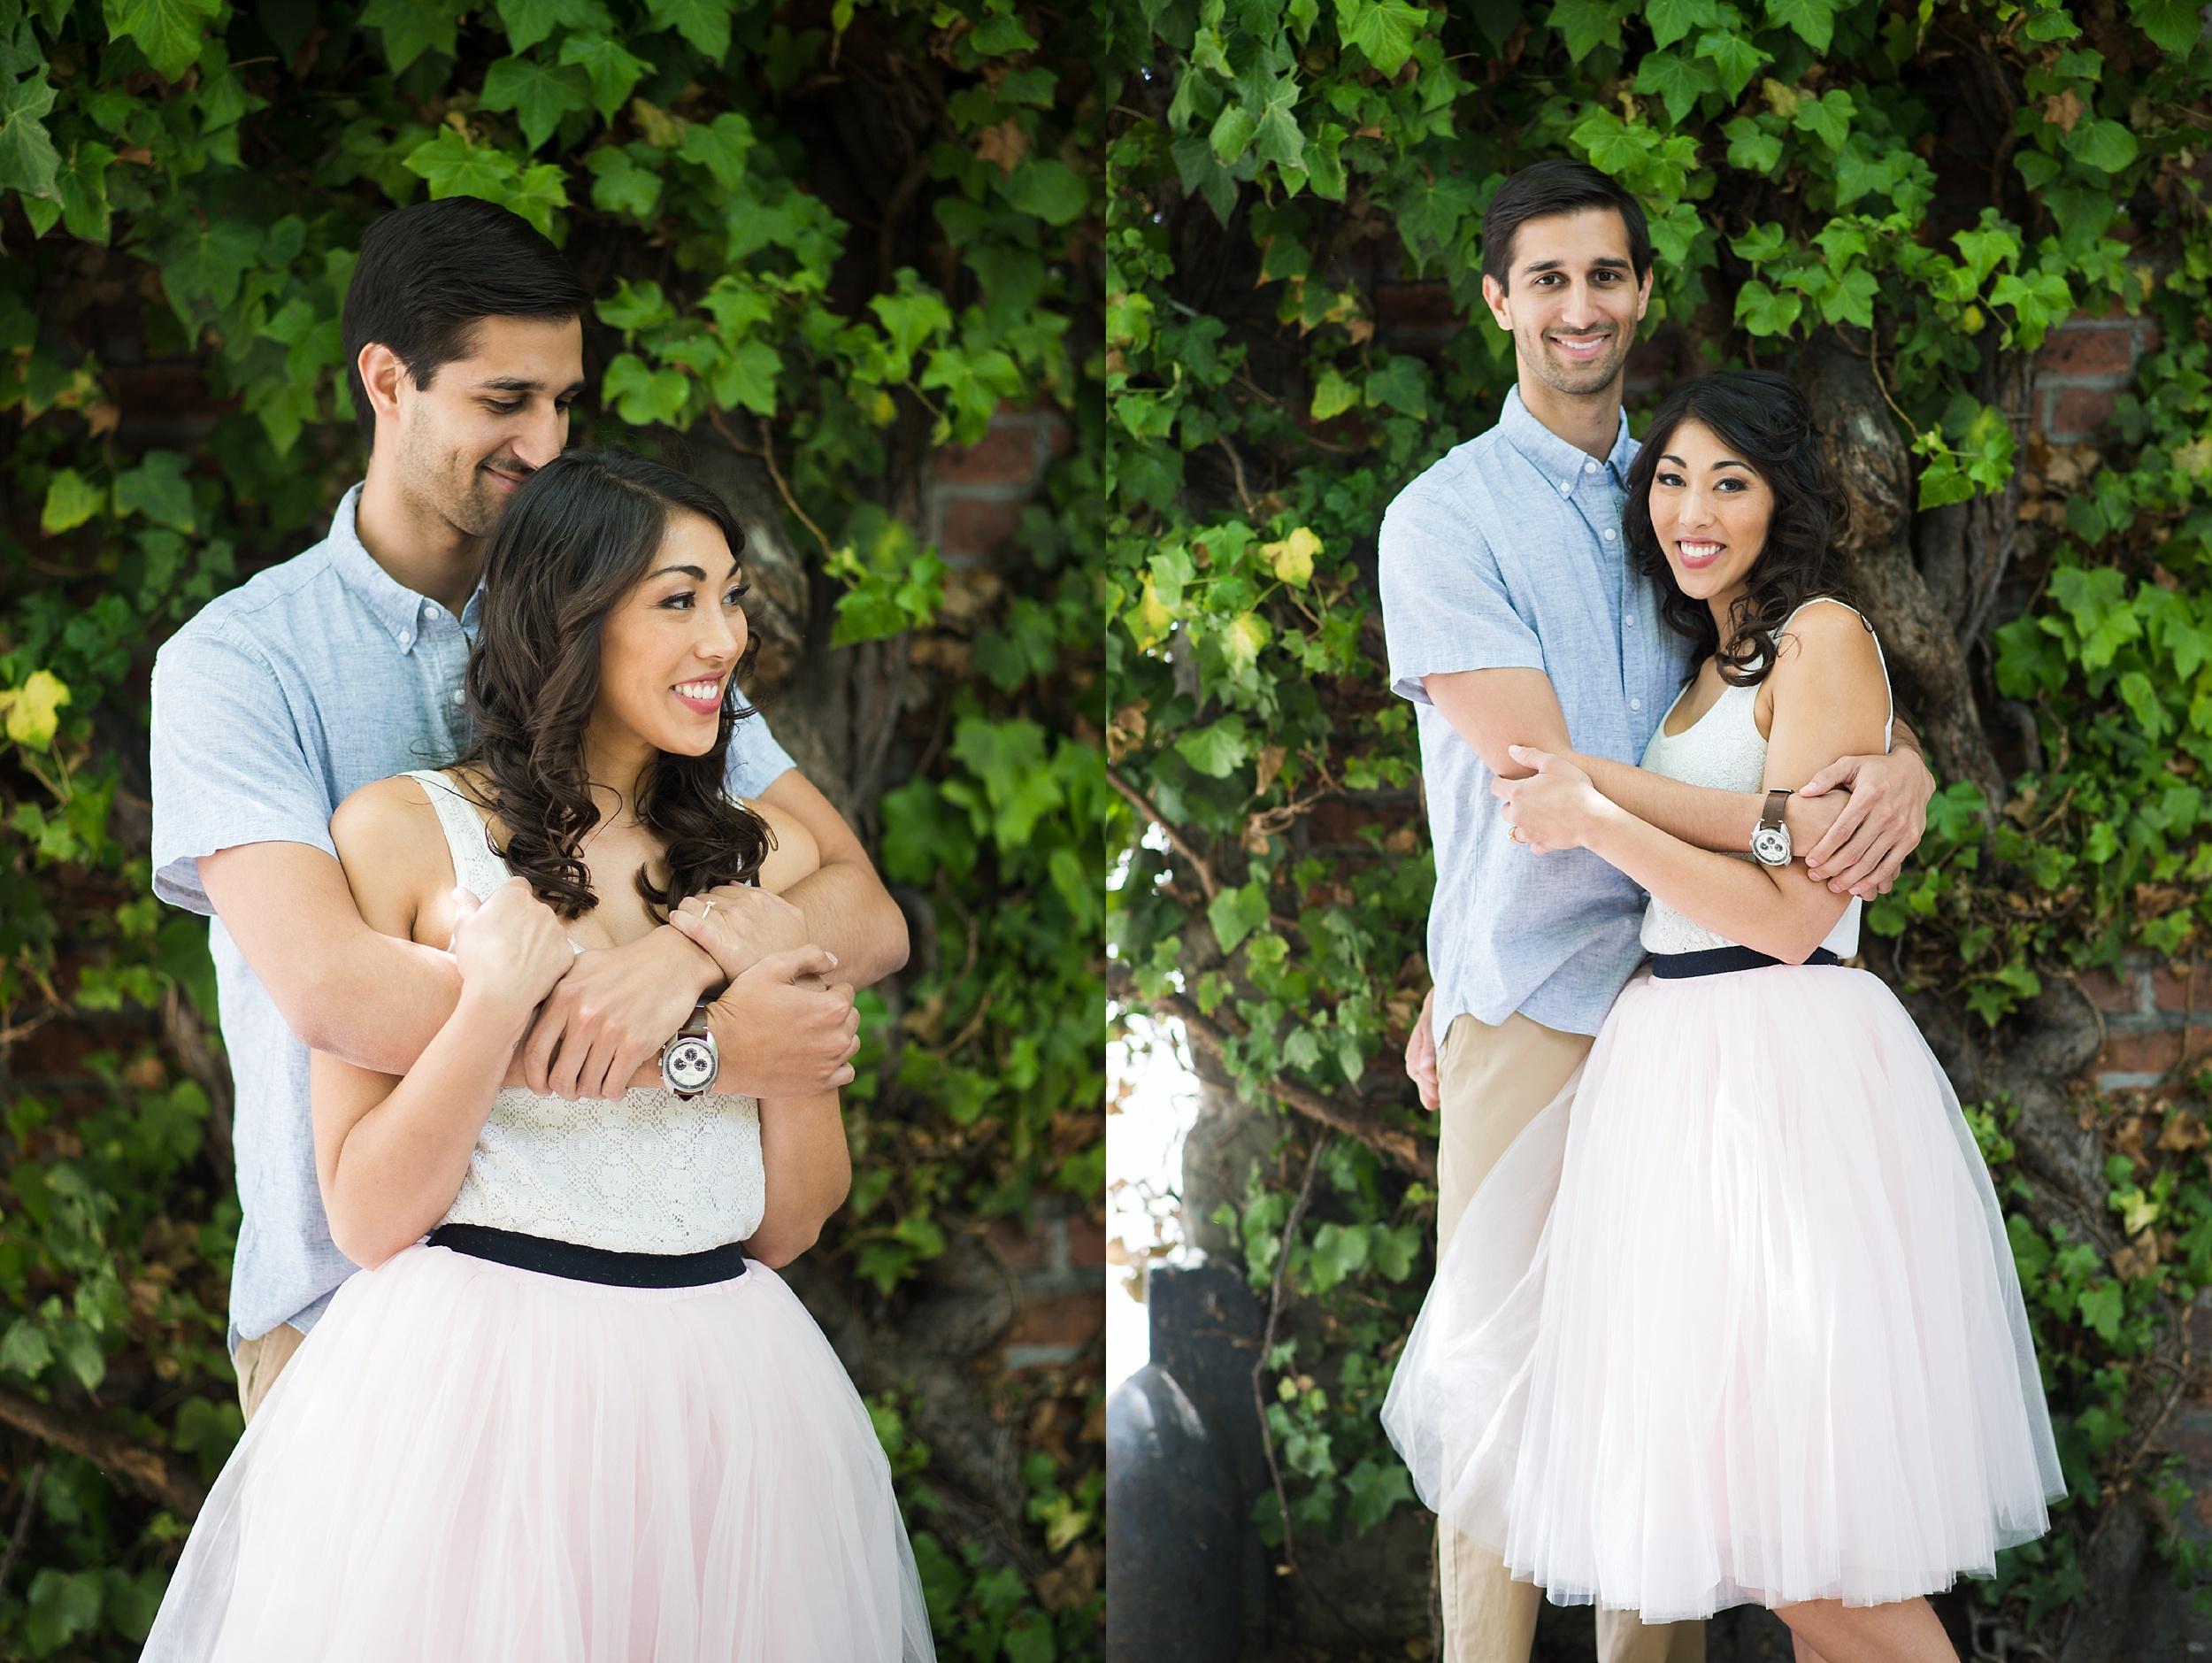 lockandco-virginia-dc-maryland-weddings-portraits-engagements_0013.jpg